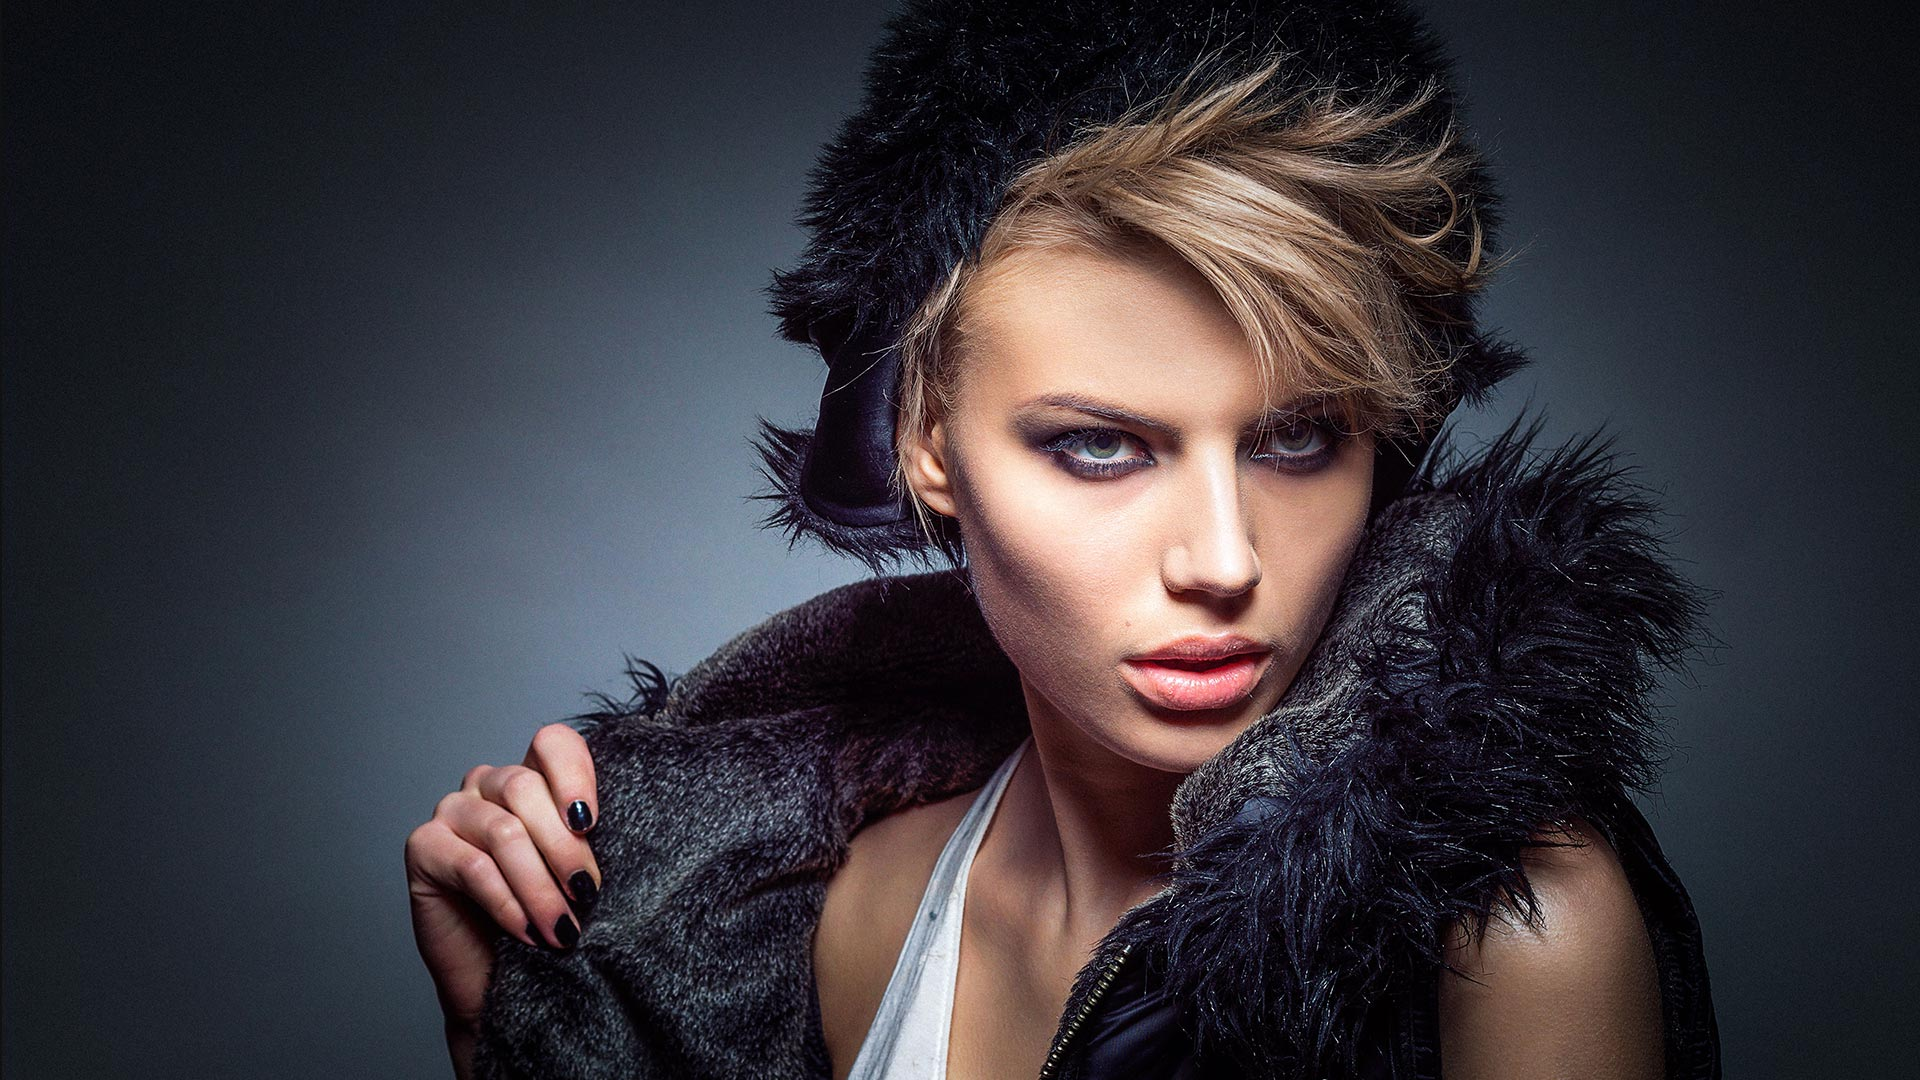 Female Model Photography - Miami Beach